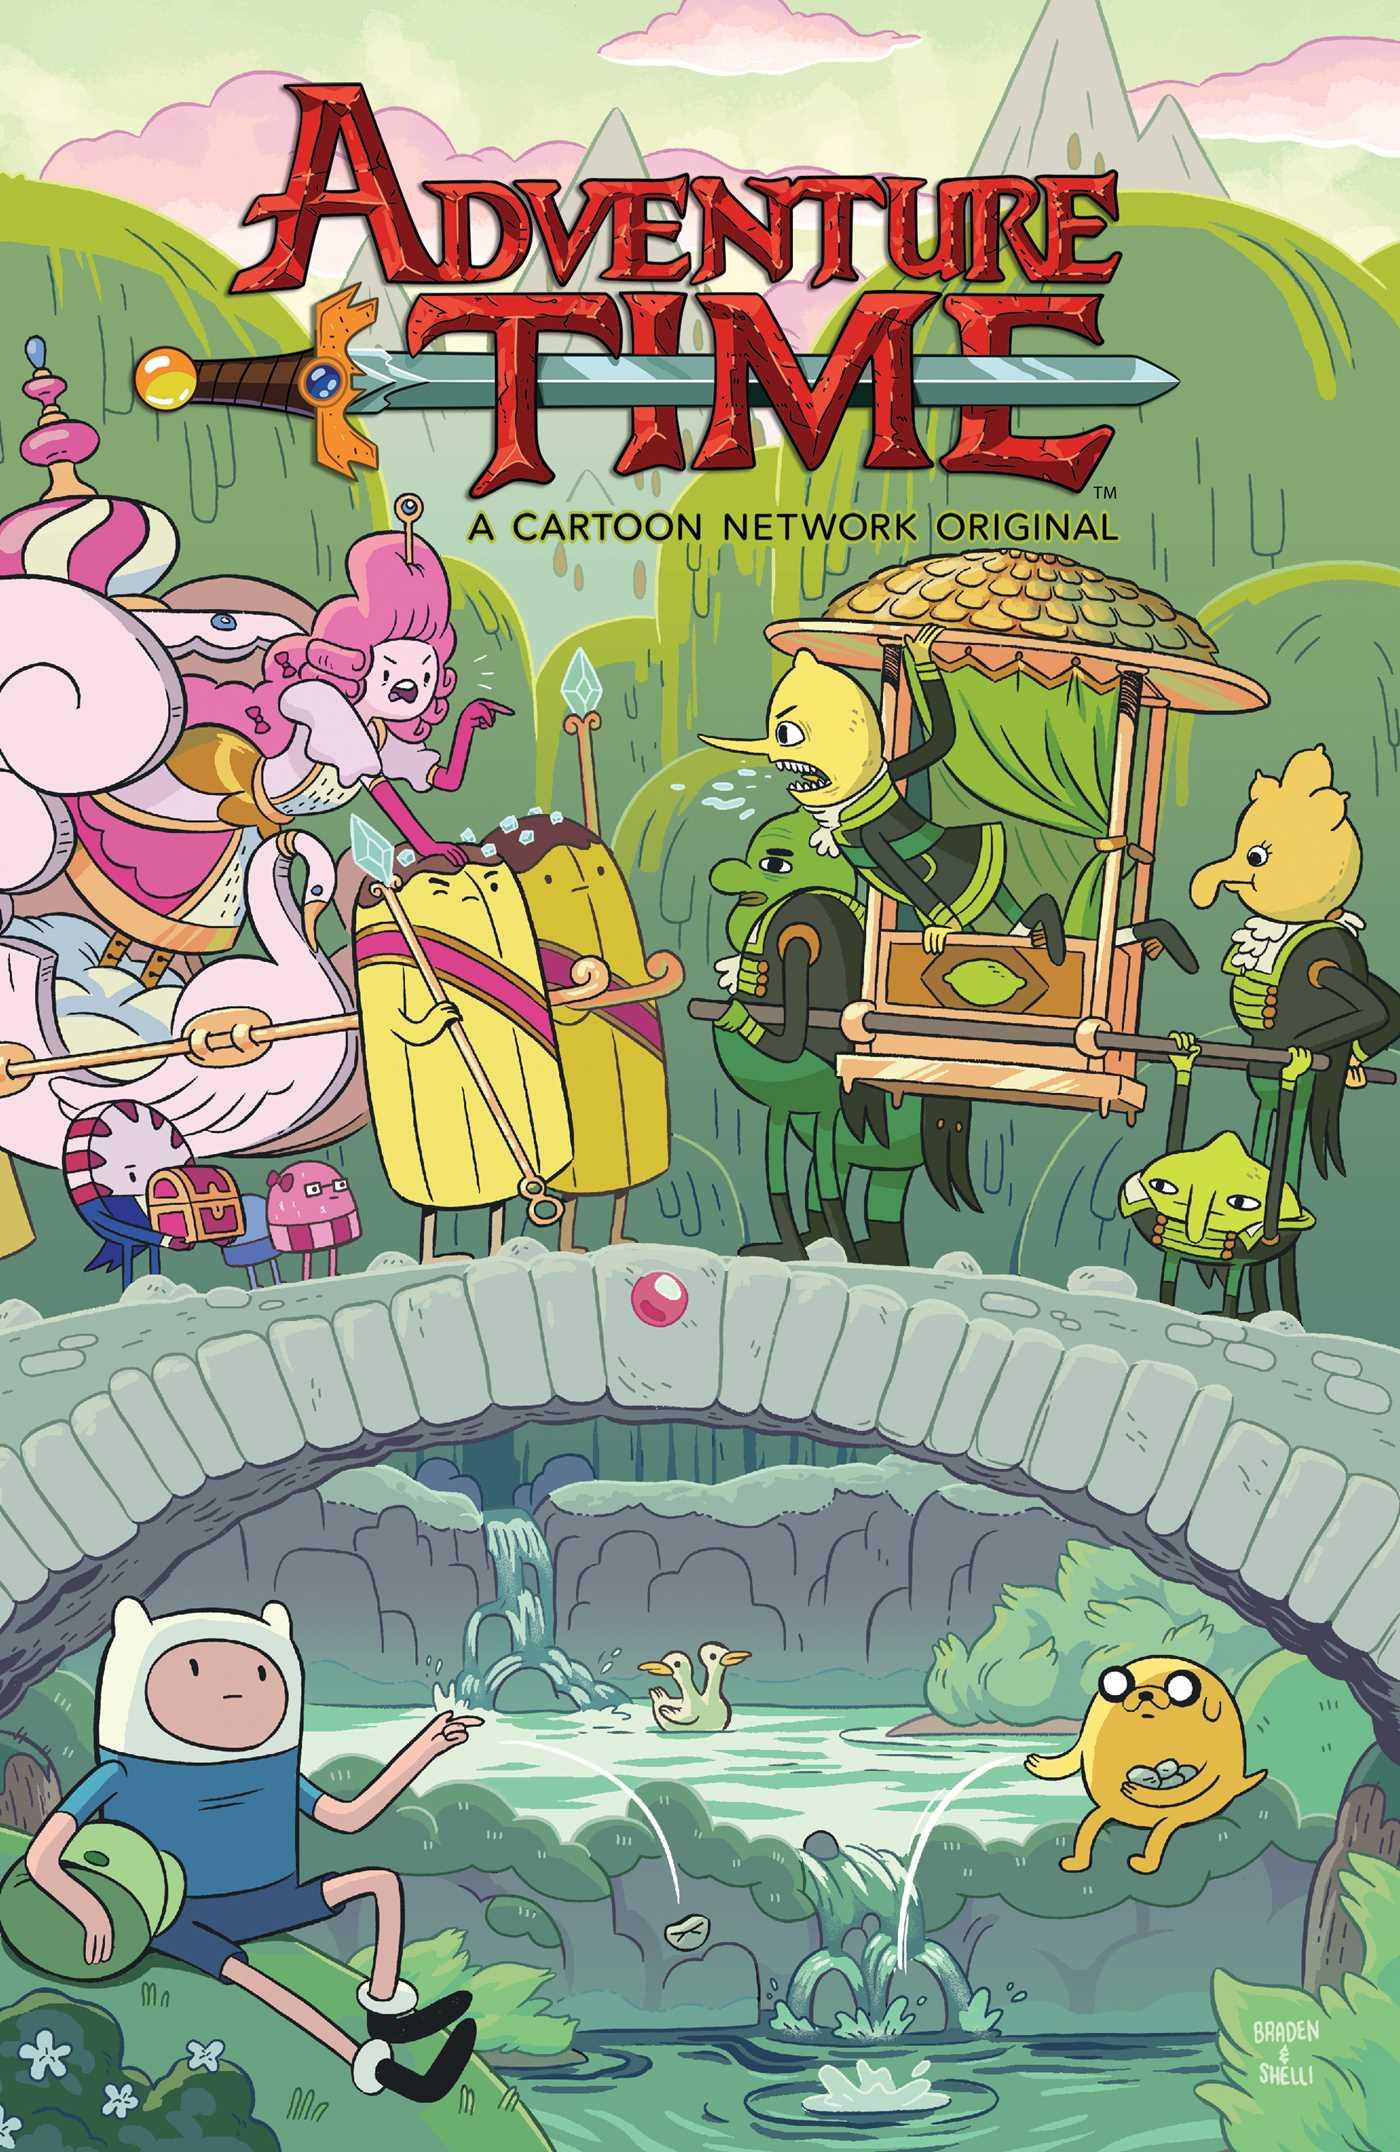 Adventure Time Princess Day adventure time vol. 15 | bookdelilah s. dawson